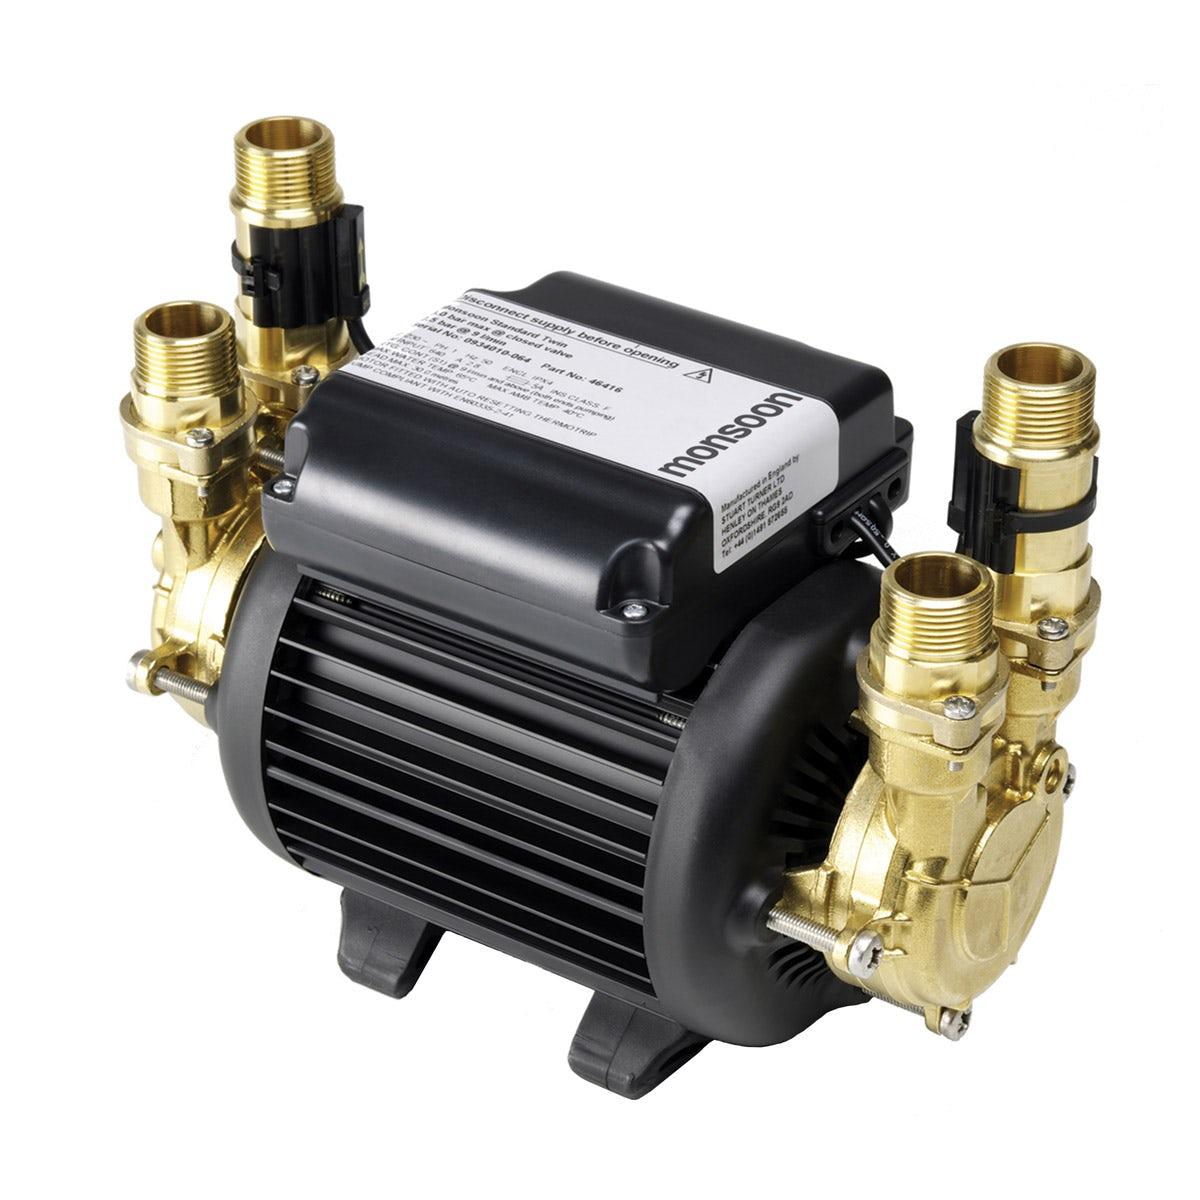 Stuart Turner Monsoon standard 2.0 bar twin shower pump